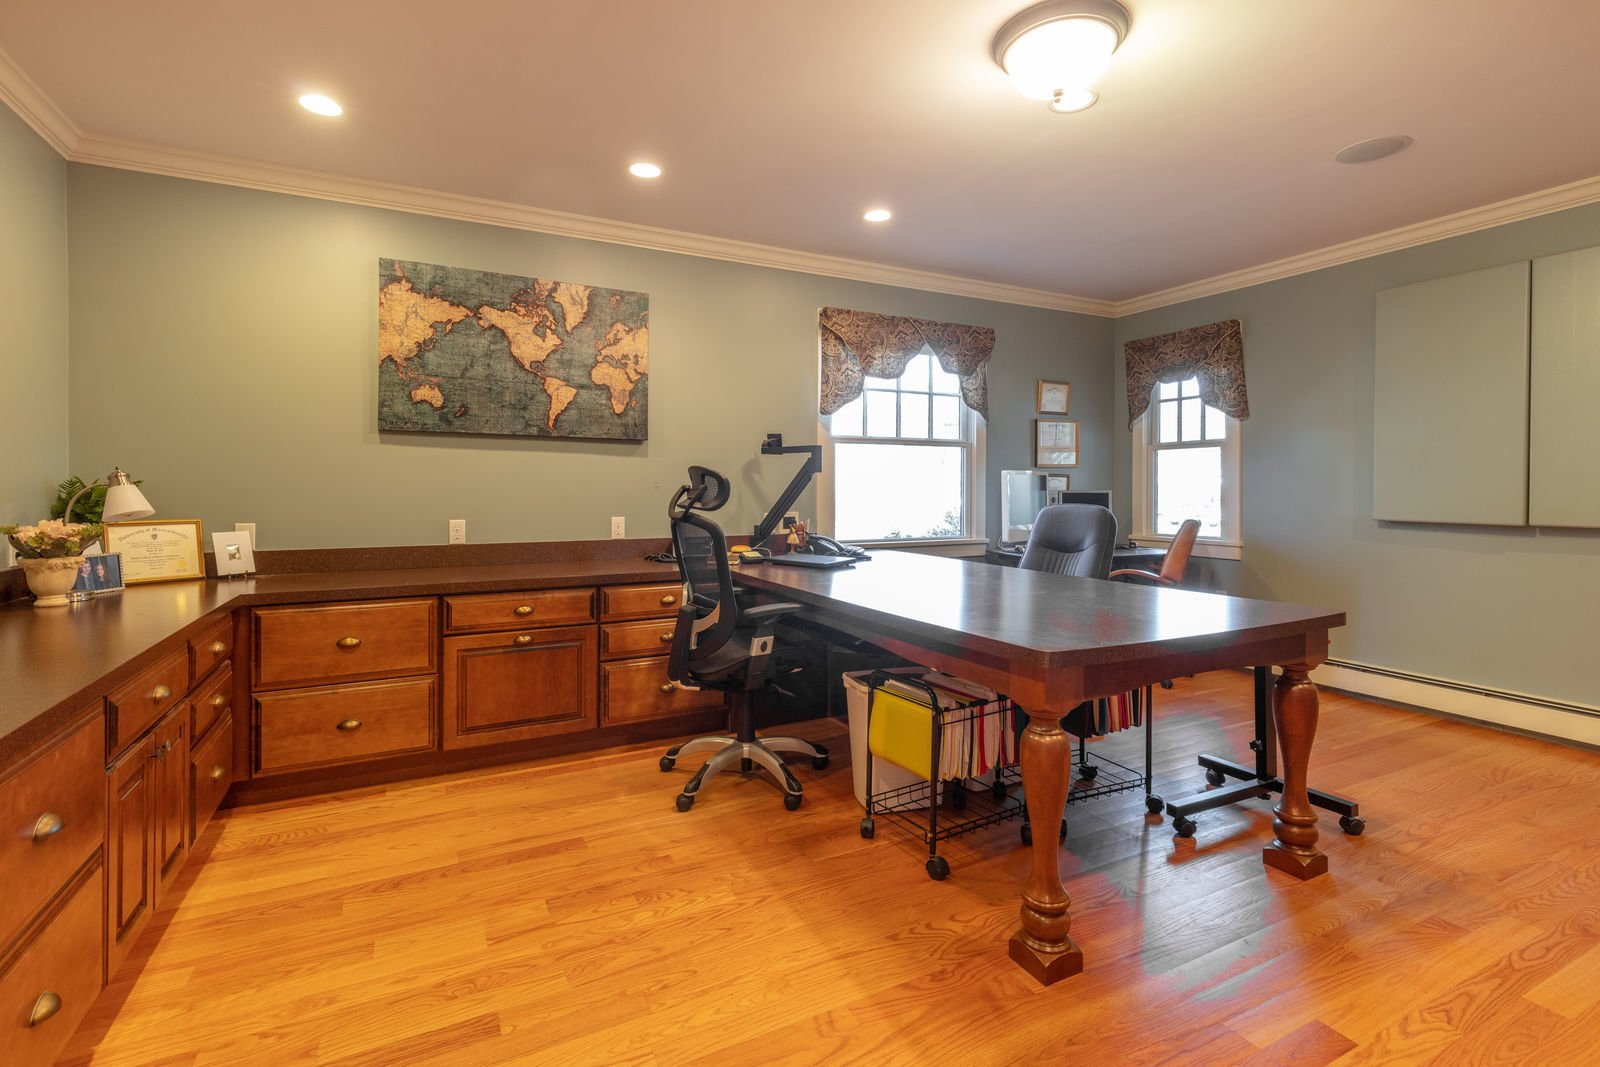 Office, Chair, Medium Hardwood Floor, and Study Room Type  Shingle Style Rustic Chic